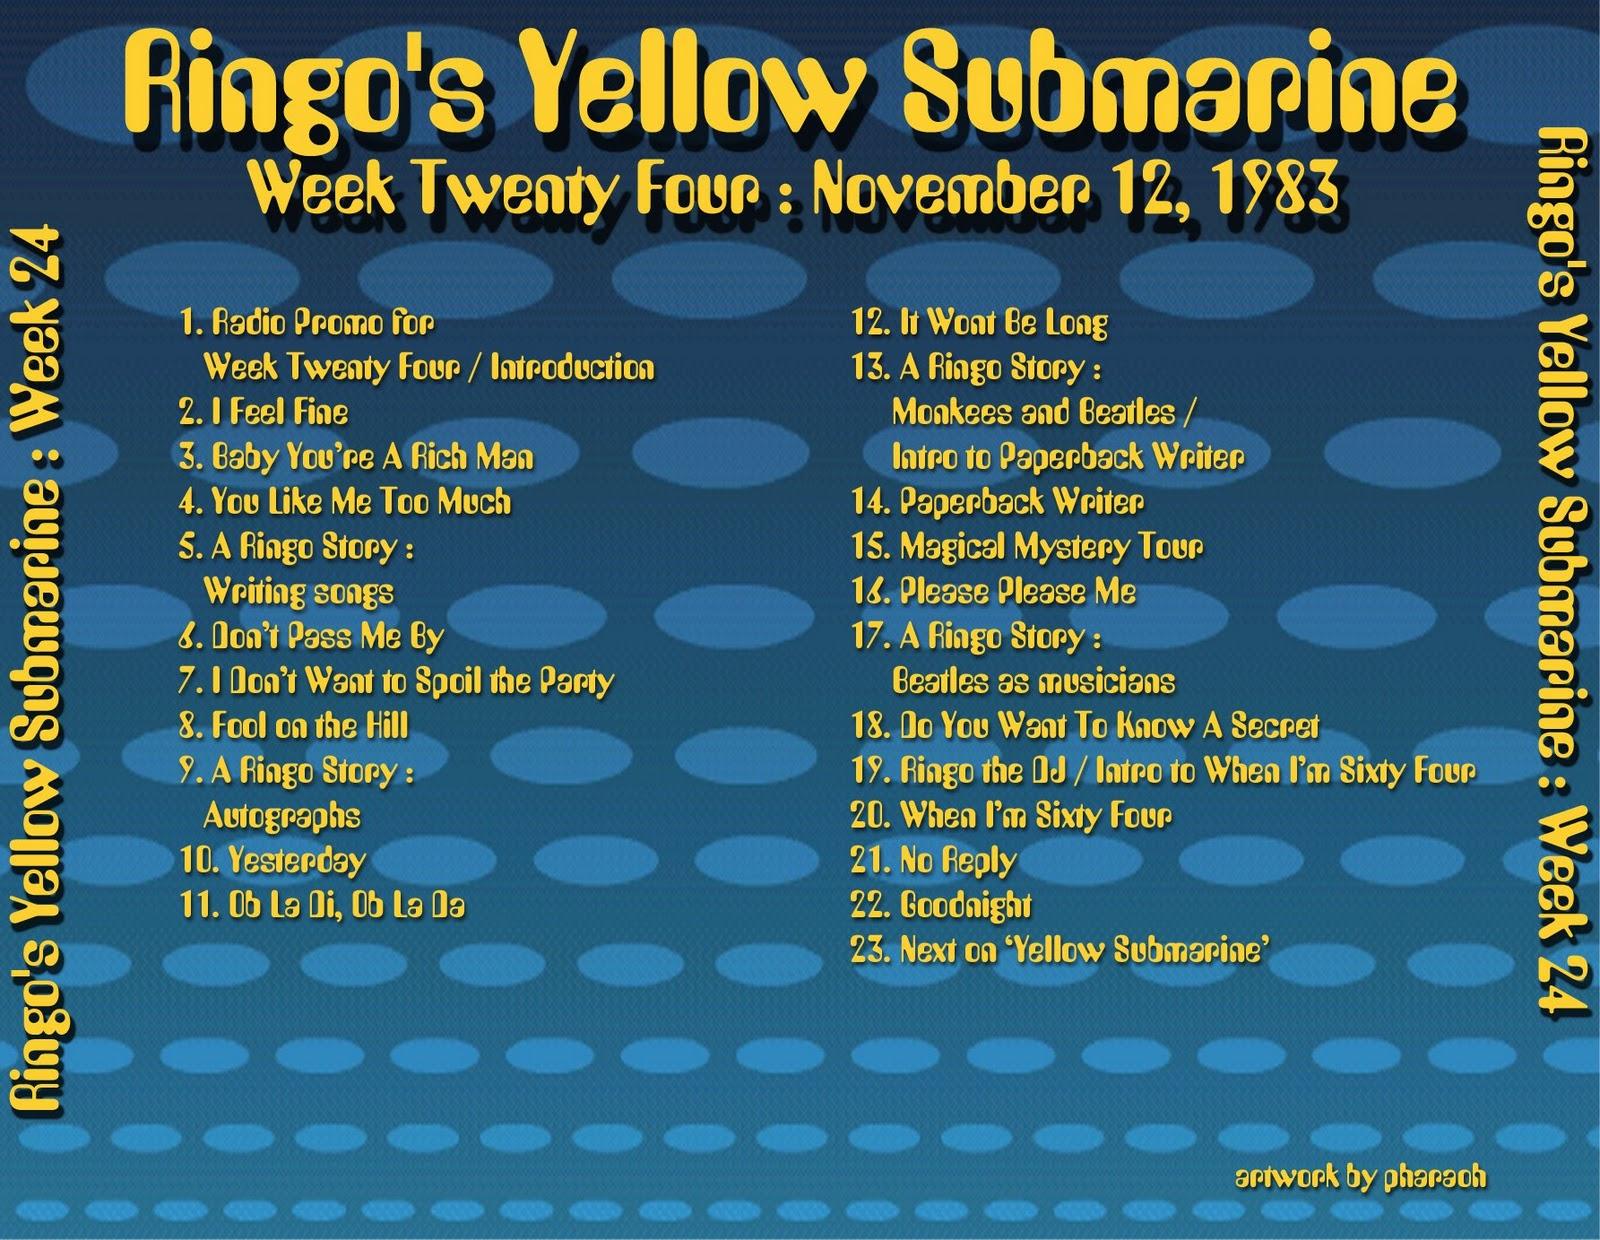 Beatles Radio Waves: 1983 11 12 Ringo's Yellow Submarine 24 #B99A12 1600 1240